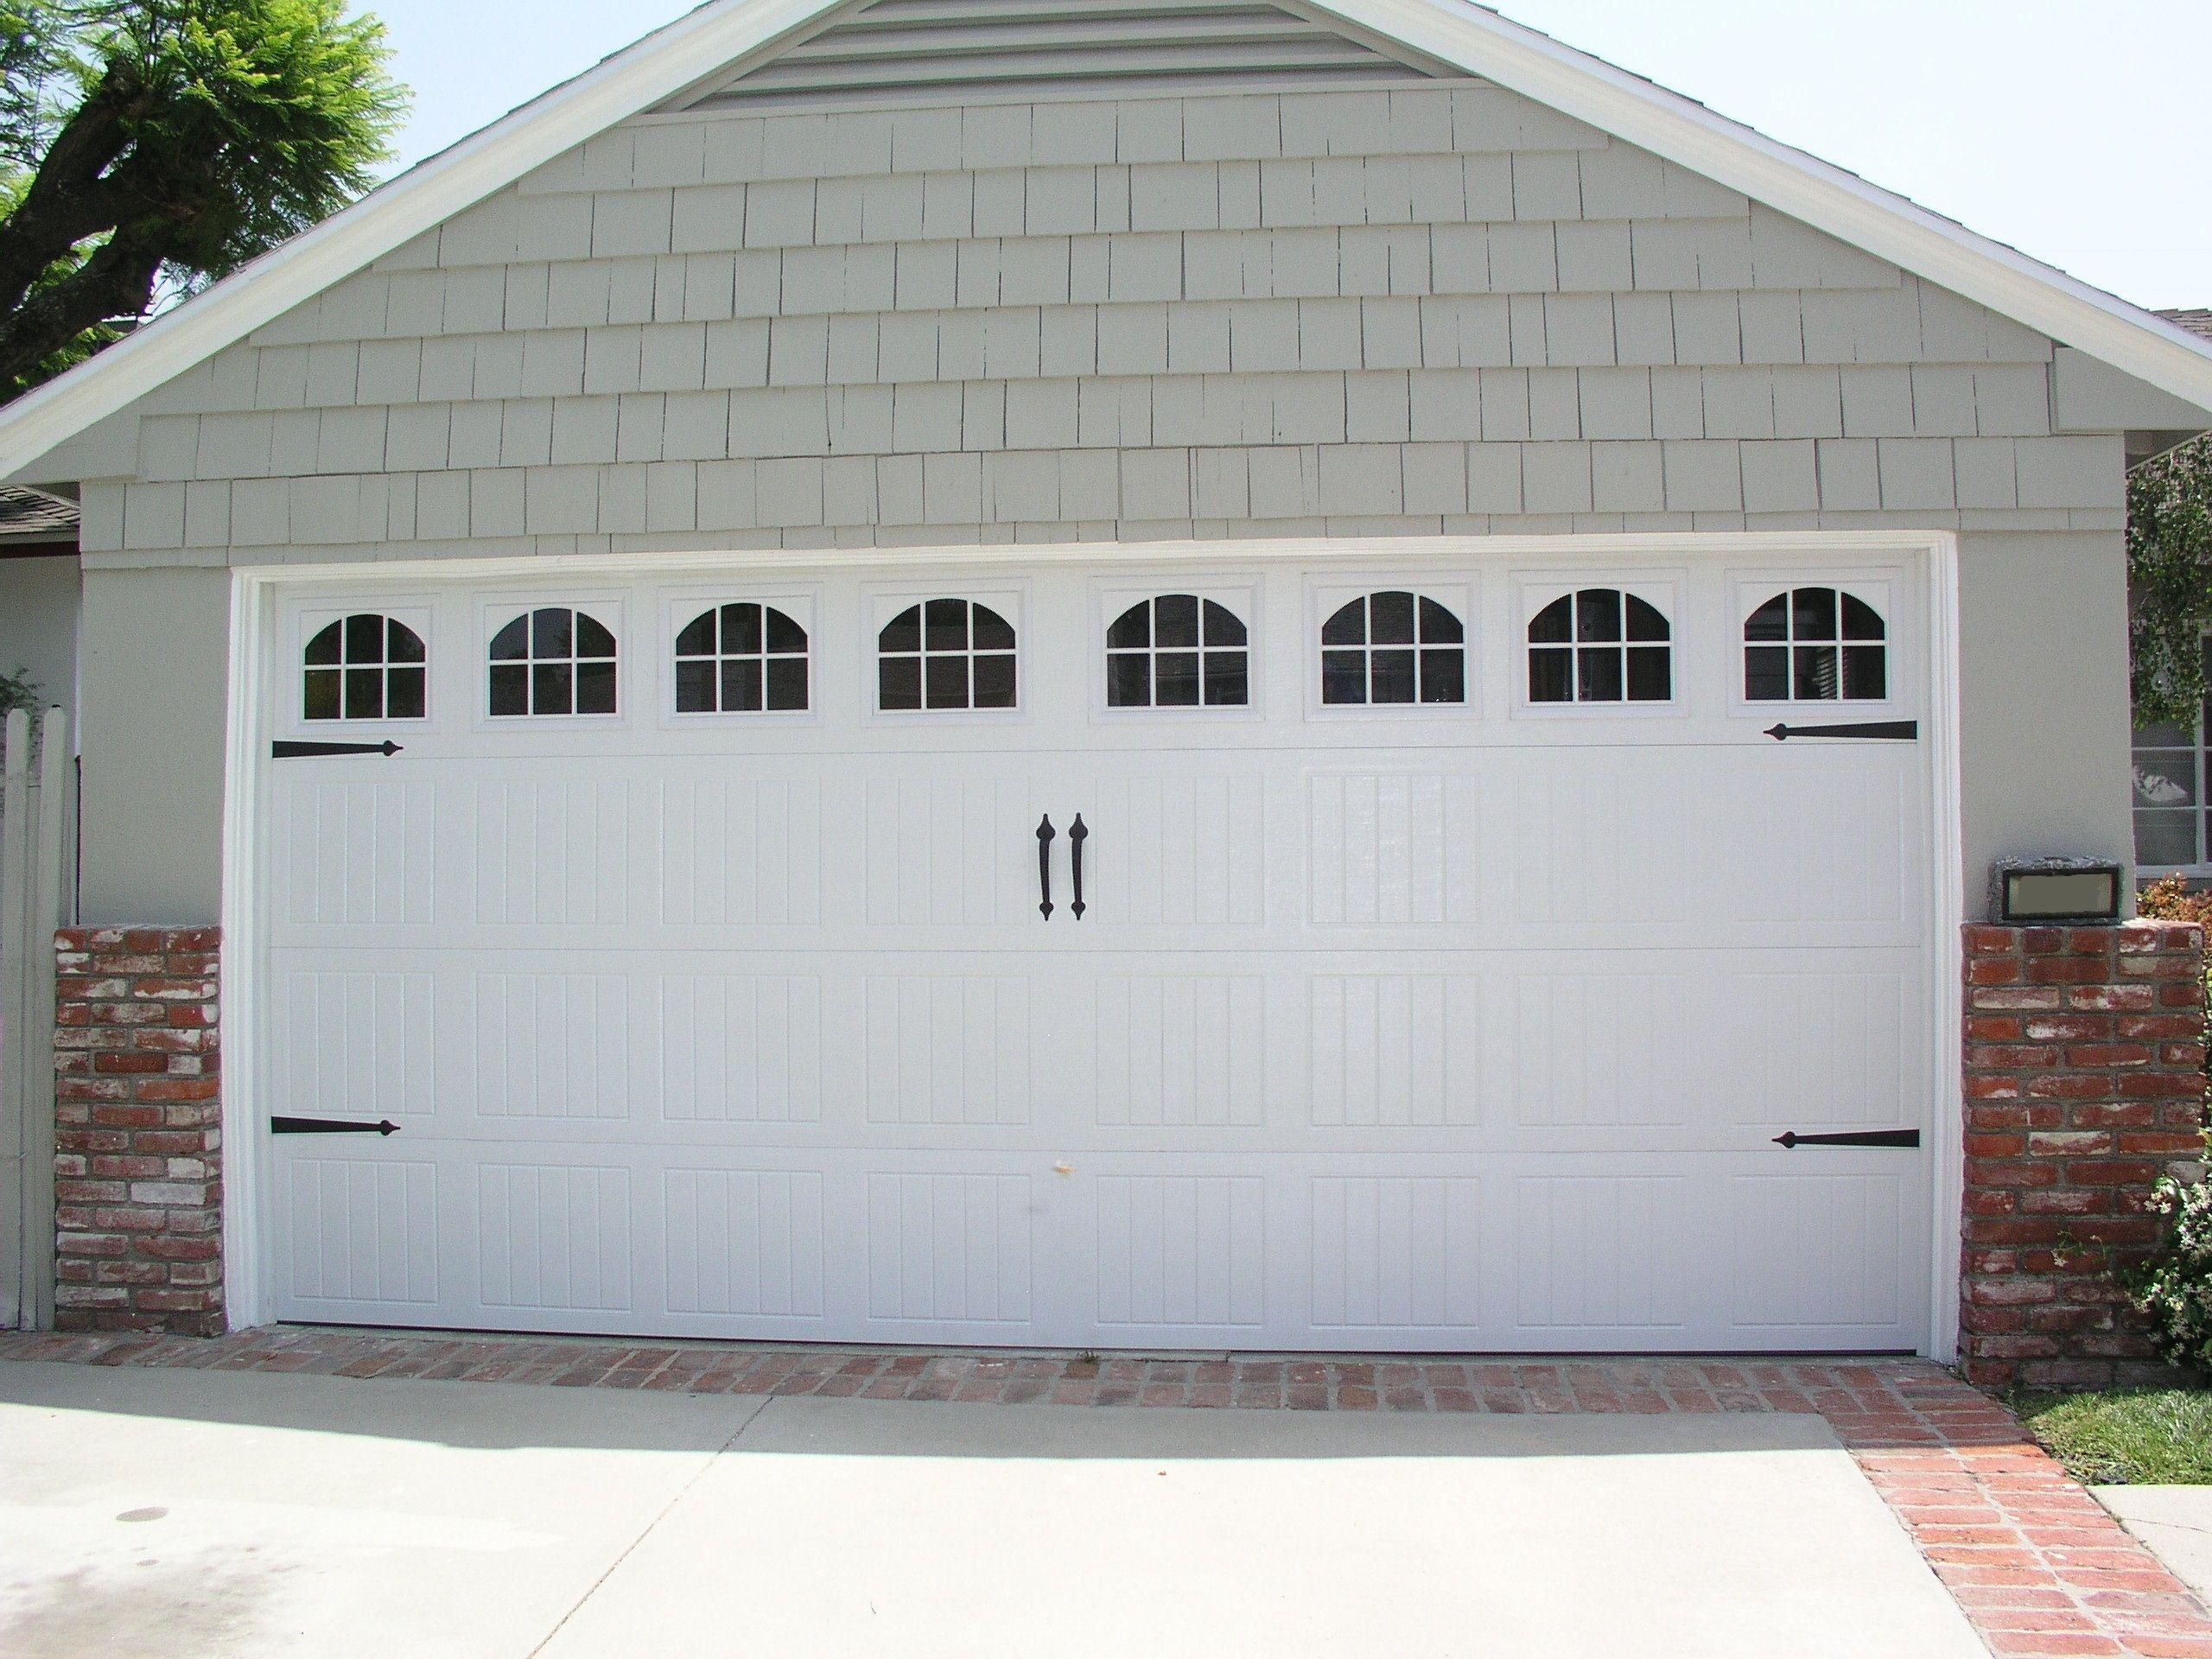 hight resolution of wayne dalton sonoma white cascade with decorative hardware los angeles ca photo credit agi dyer garagedoor garagedoors garages garage door